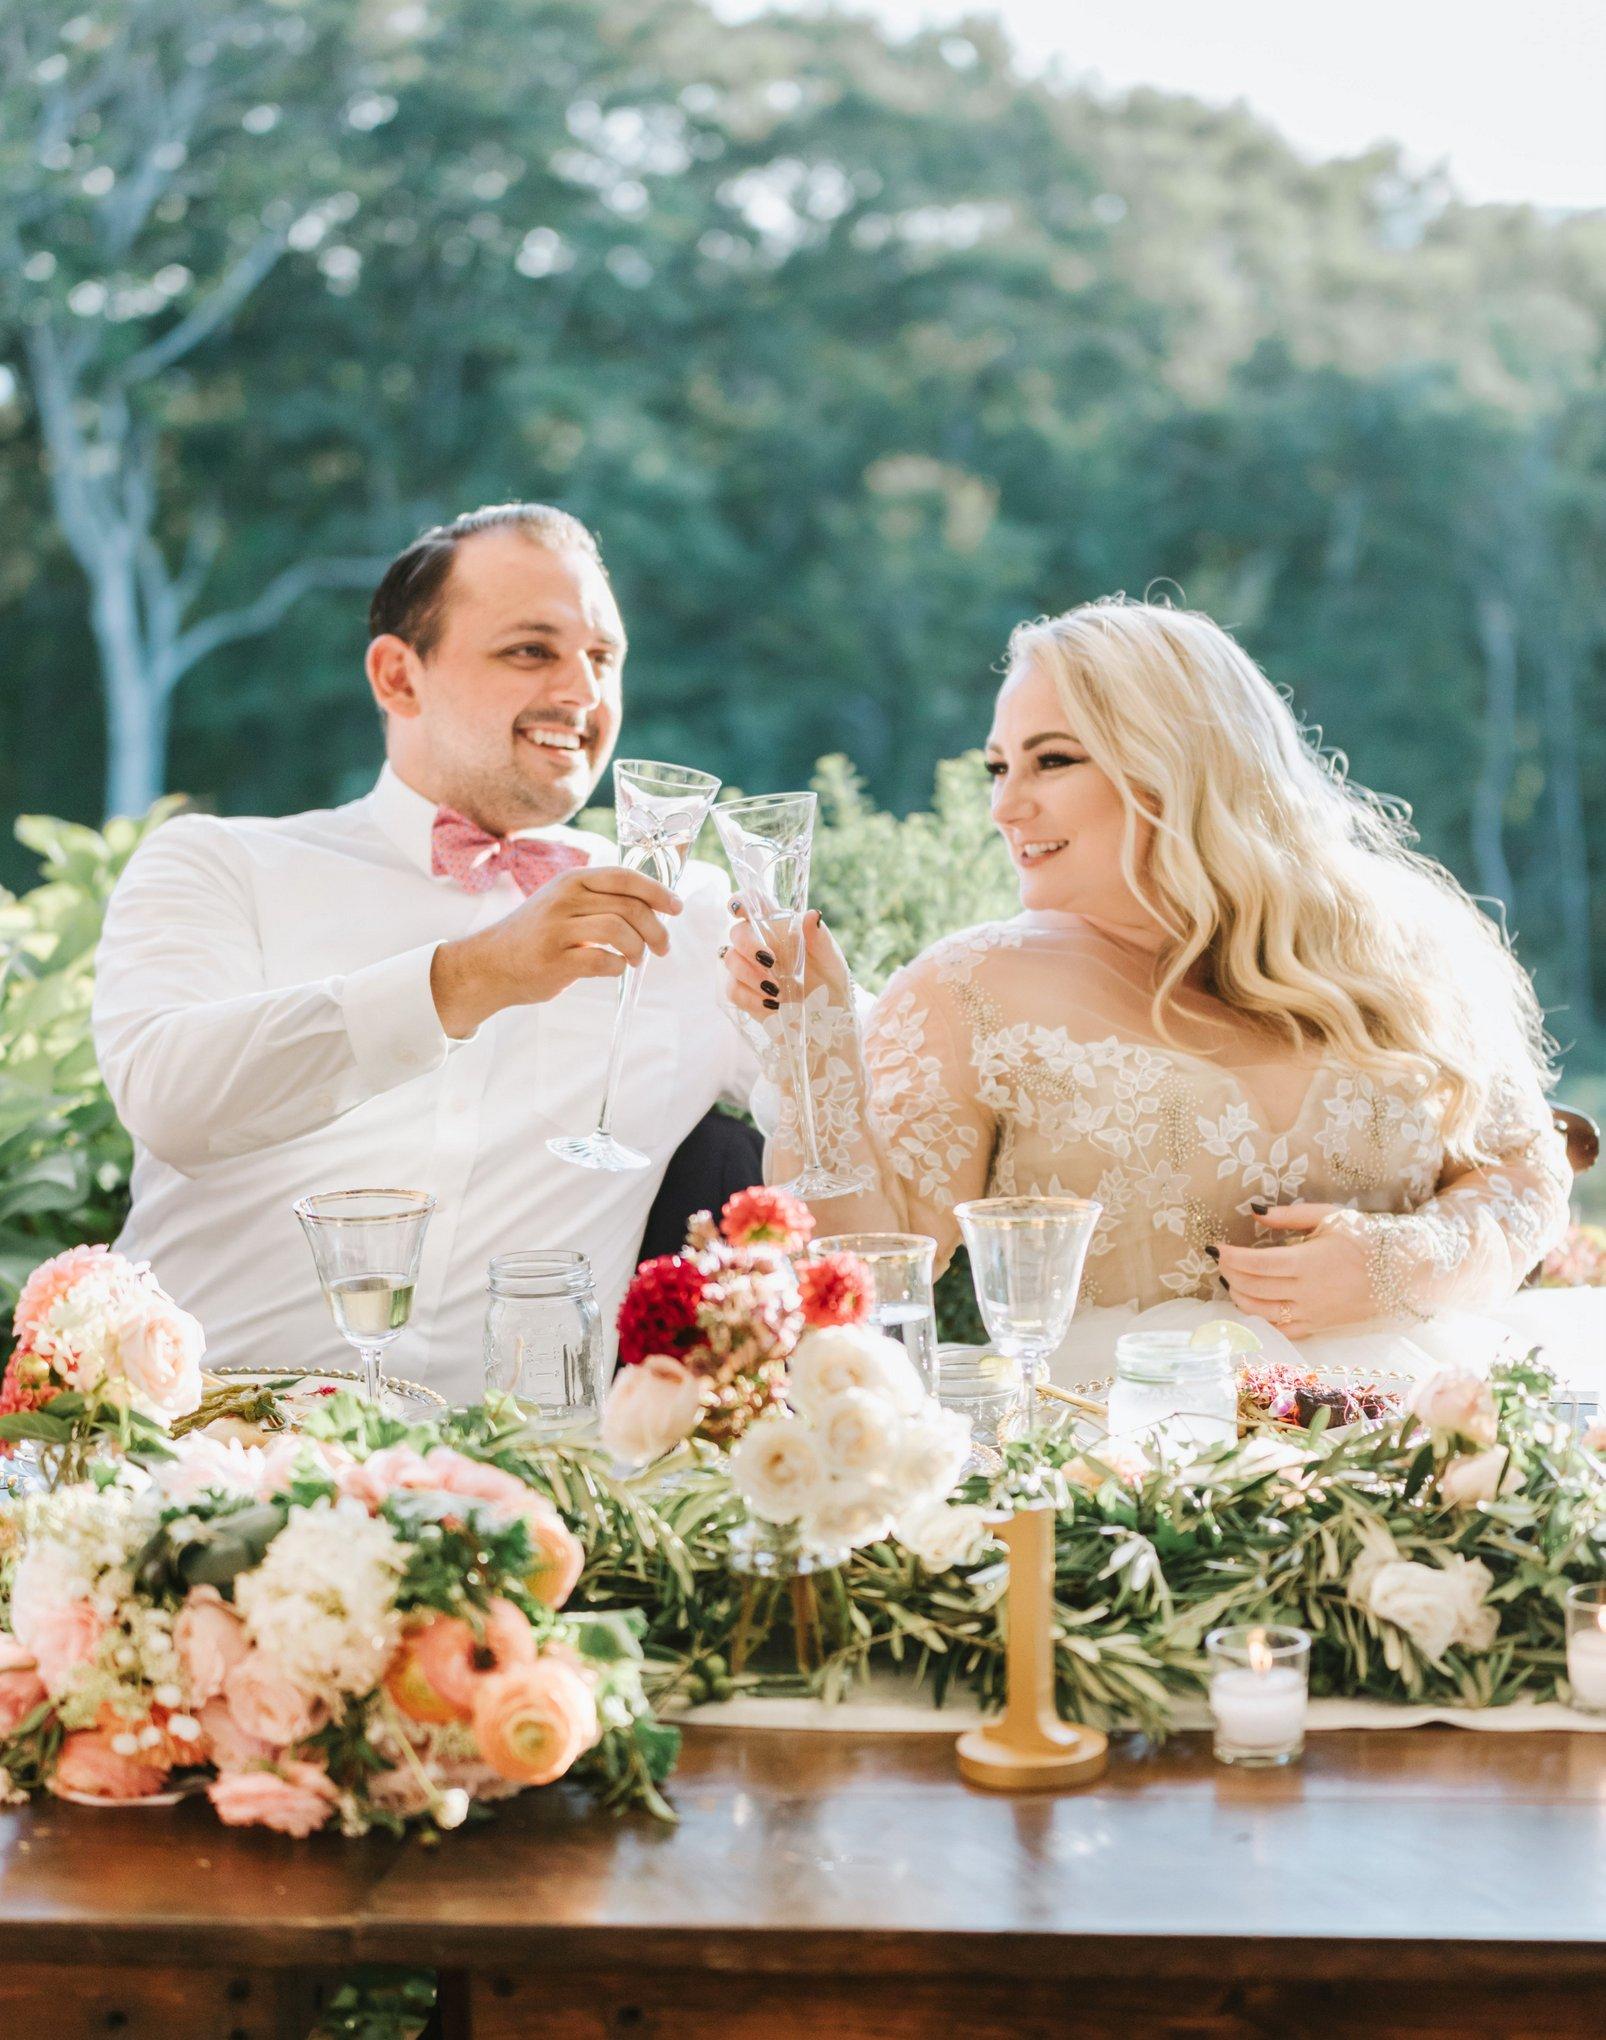 Marthas-Vineyard-Wedding-Photographer-Beach-Plum-Inn-33.jpg